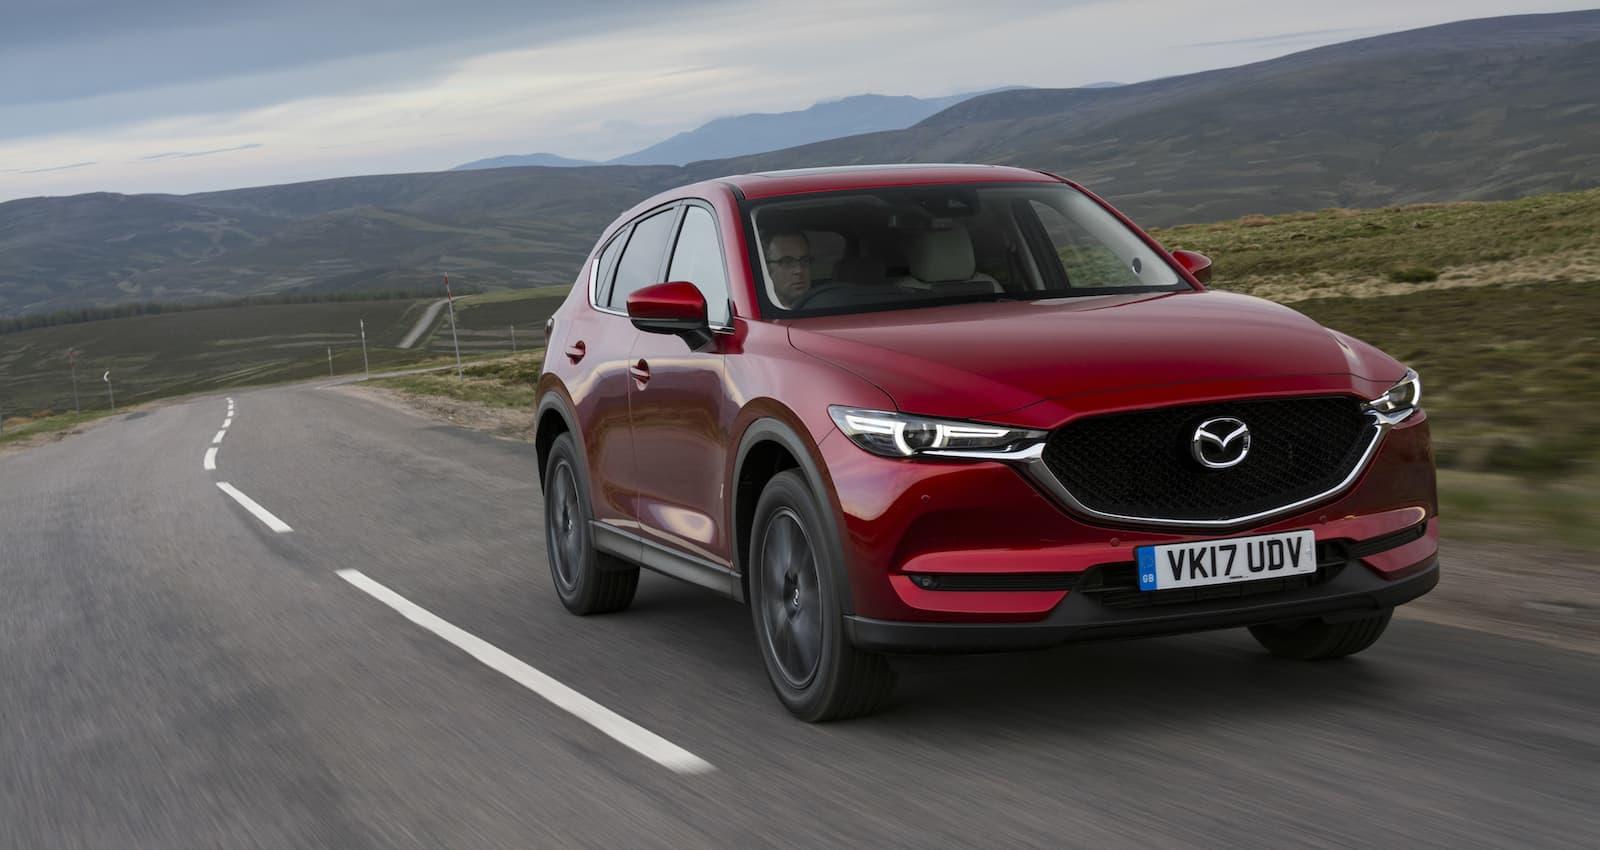 Mazda CX-5 (2017) new car ratings and reviews | The Car Expert